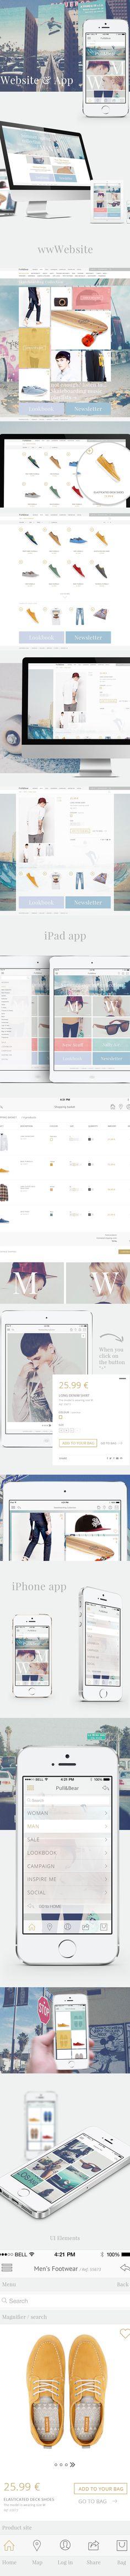 Pull&Bear // Web & App - http://www.webdesignserved.com/gallery/Pull-Bear-Web-App/7415681